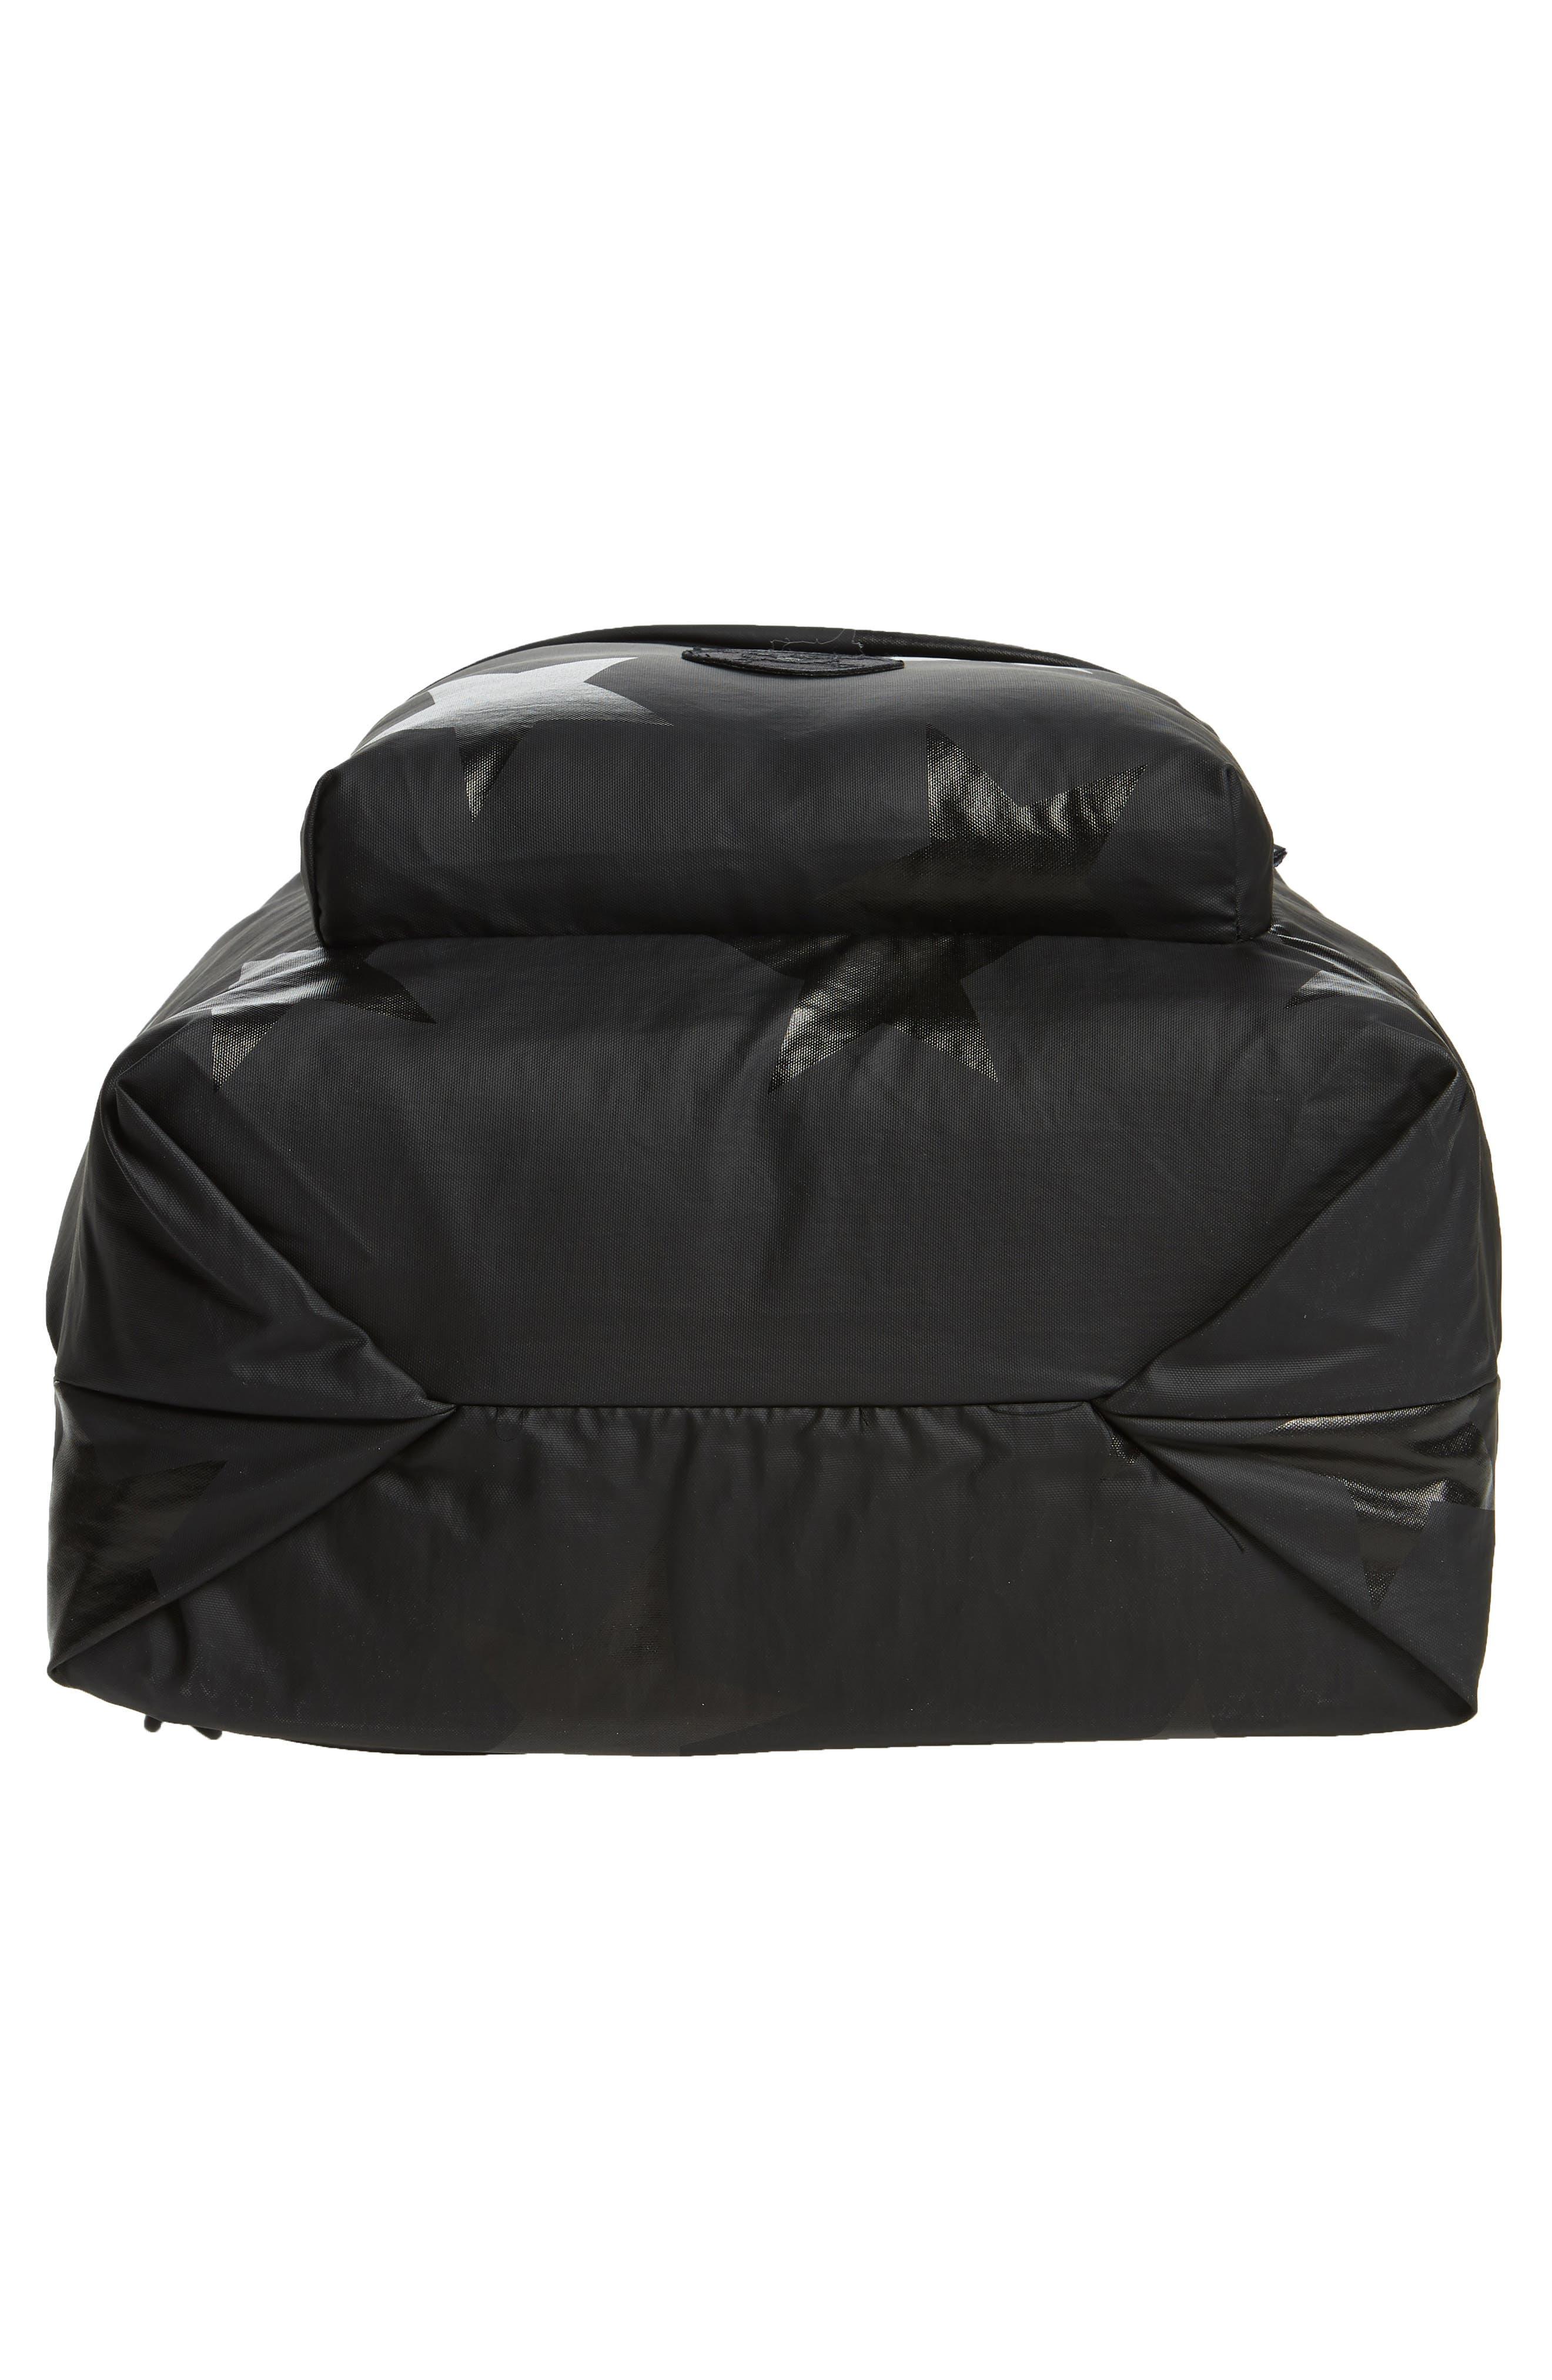 +one duo Nylon Convertible Diaper Bag,                             Alternate thumbnail 6, color,                             BLACK STAR